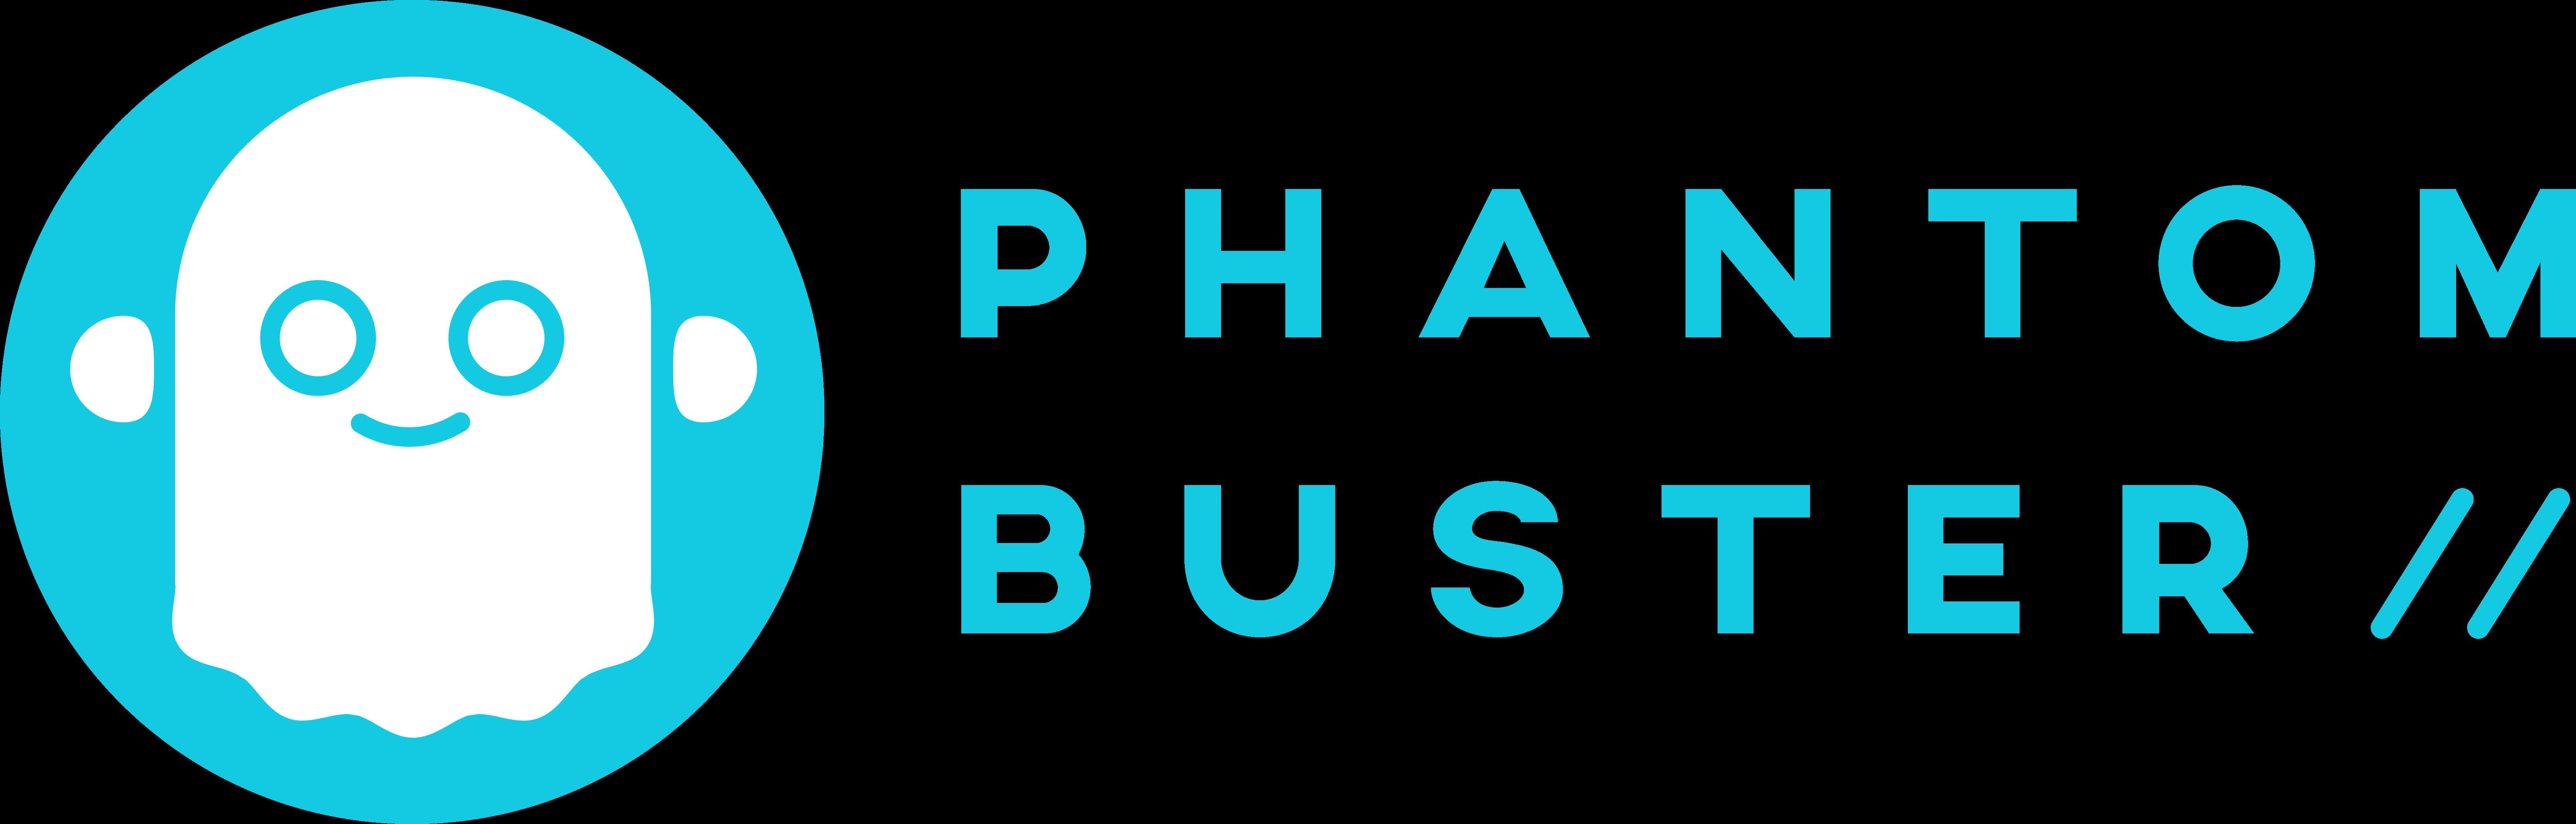 Phantom Buster